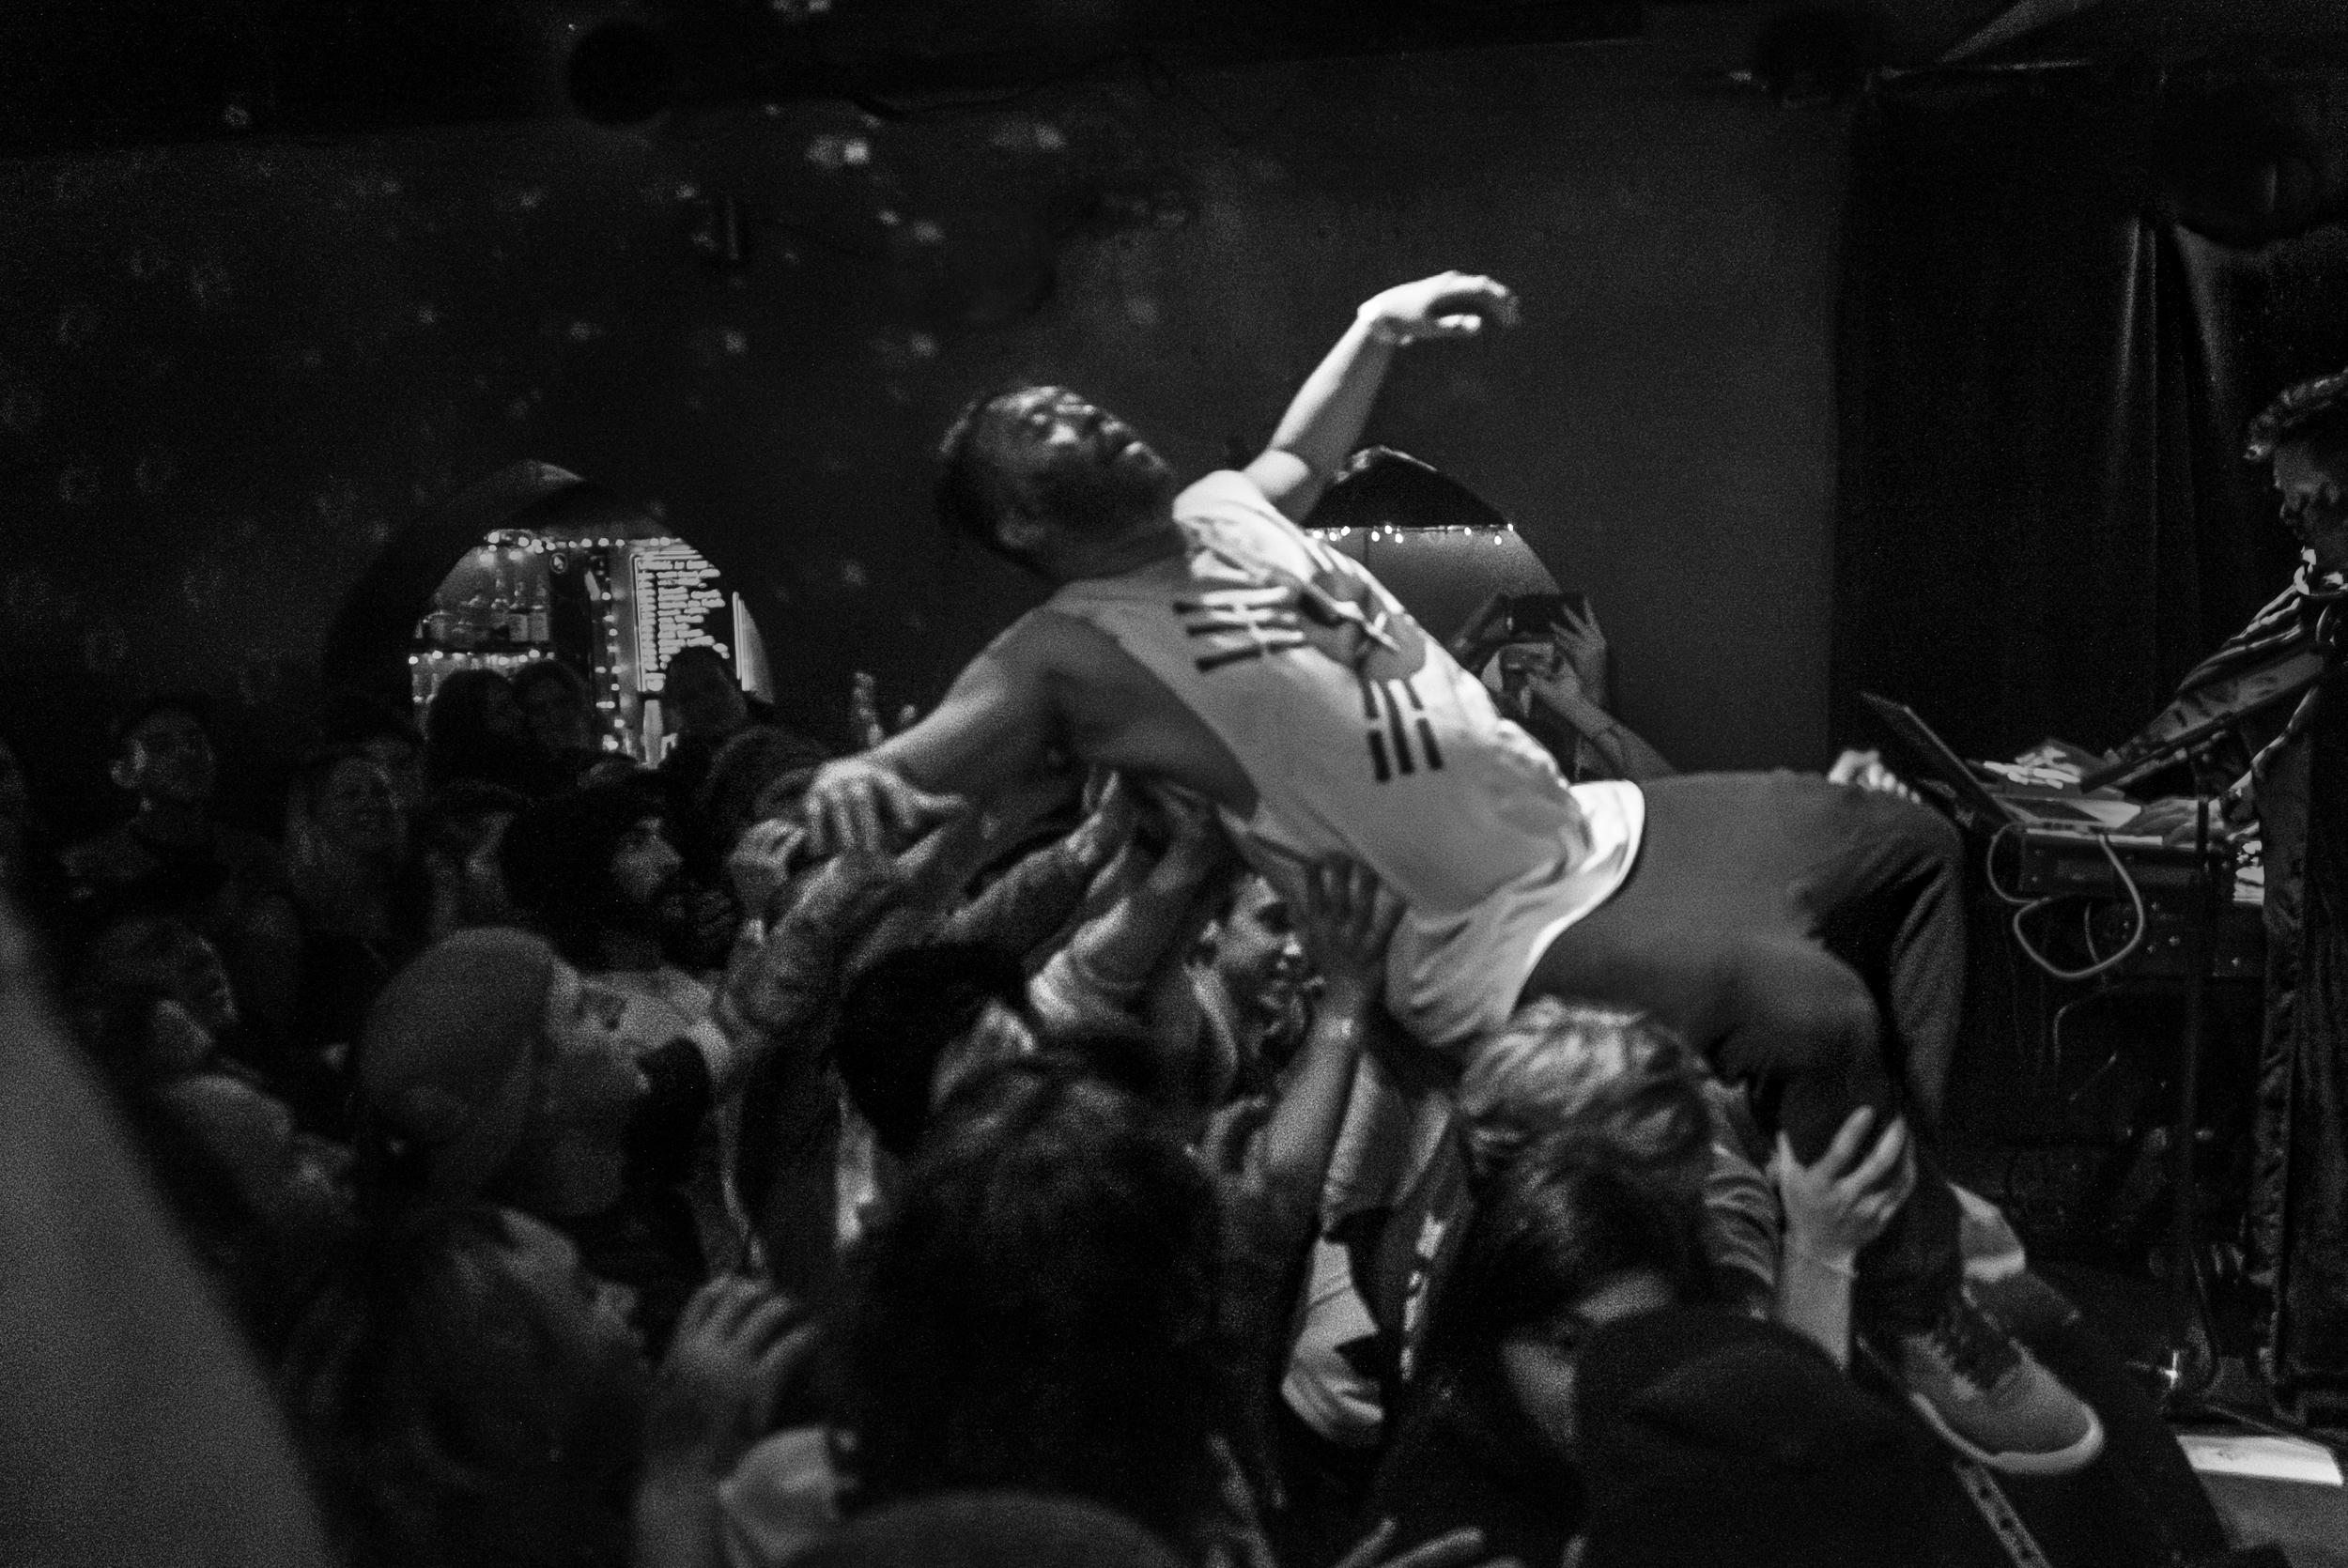 david-choe-mangchi-under-the-cobbletones-lulu-east-coast-tour-2016-tour-live-music-22.jpg